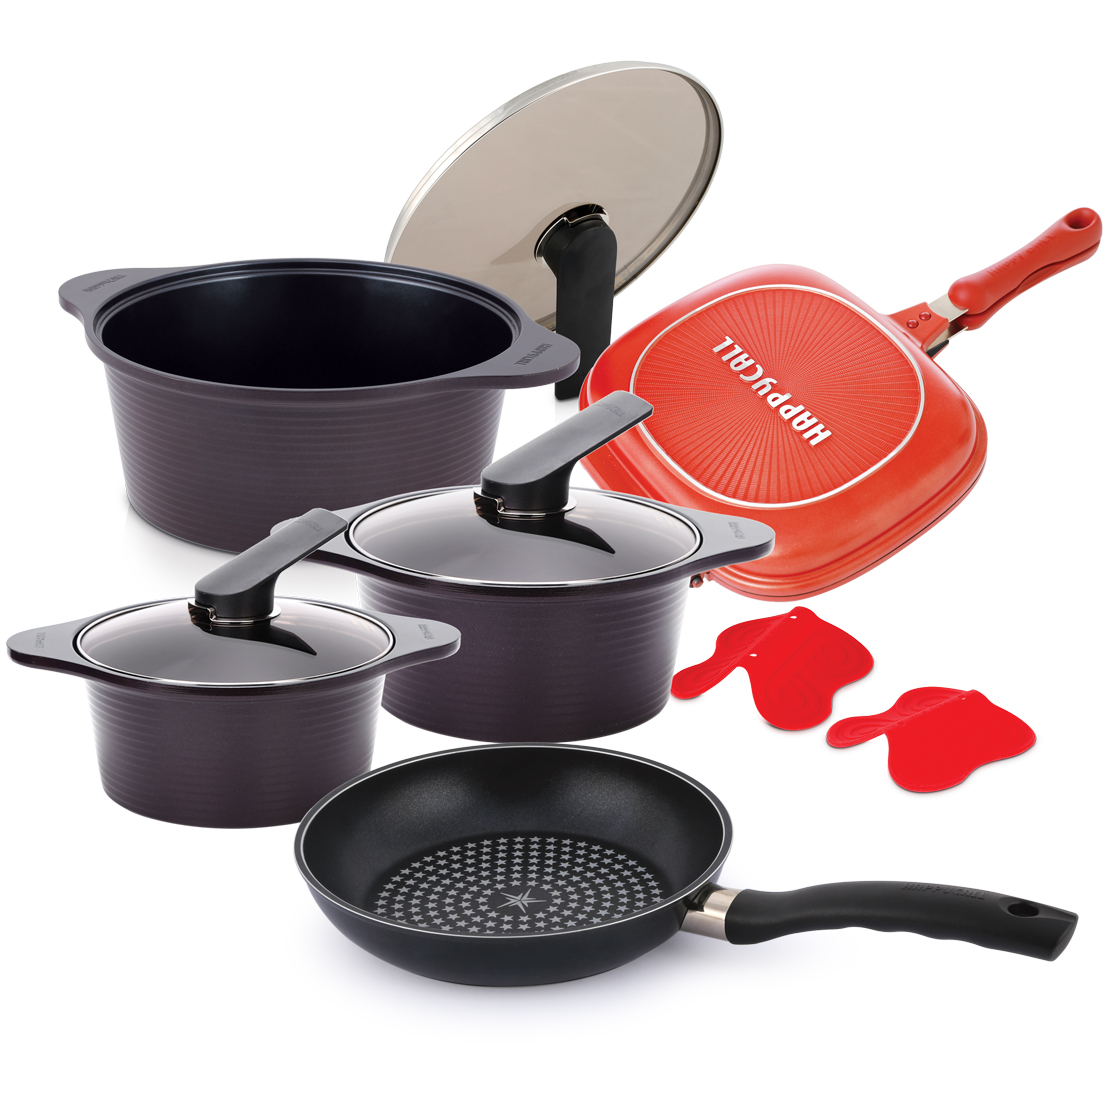 9 Pcs cookware set